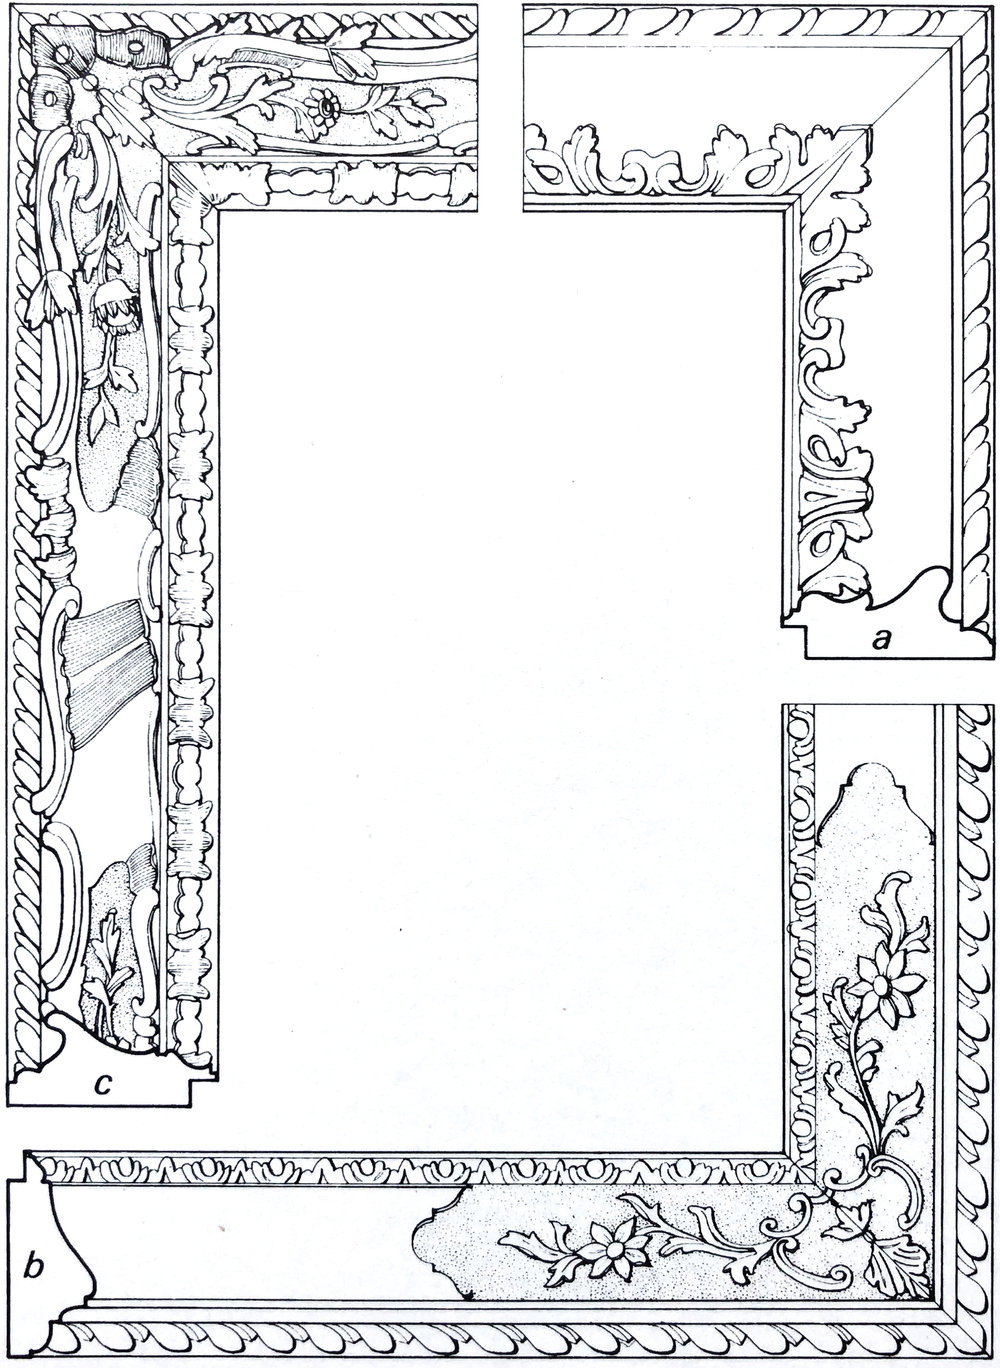 "Рис. 25 Венецианские рамы рококо (1715-65 гг). а) рама ""Лонги"", 1740 г., оригинальная рама для картины Пьетро Логи ""Веселая пара"" b) рама ""Каналетто"", 1718 г., рама для картины жованни Баттиста Пьяццетта ""Ангел-хранитель"" c) рама рококо с асимметричными профилями, середина 18-го века, адаптирована для картины Микеле Джованни Мариески ""Вид на Гранд-канал с Санта - Мария - Делла - Салюте"""